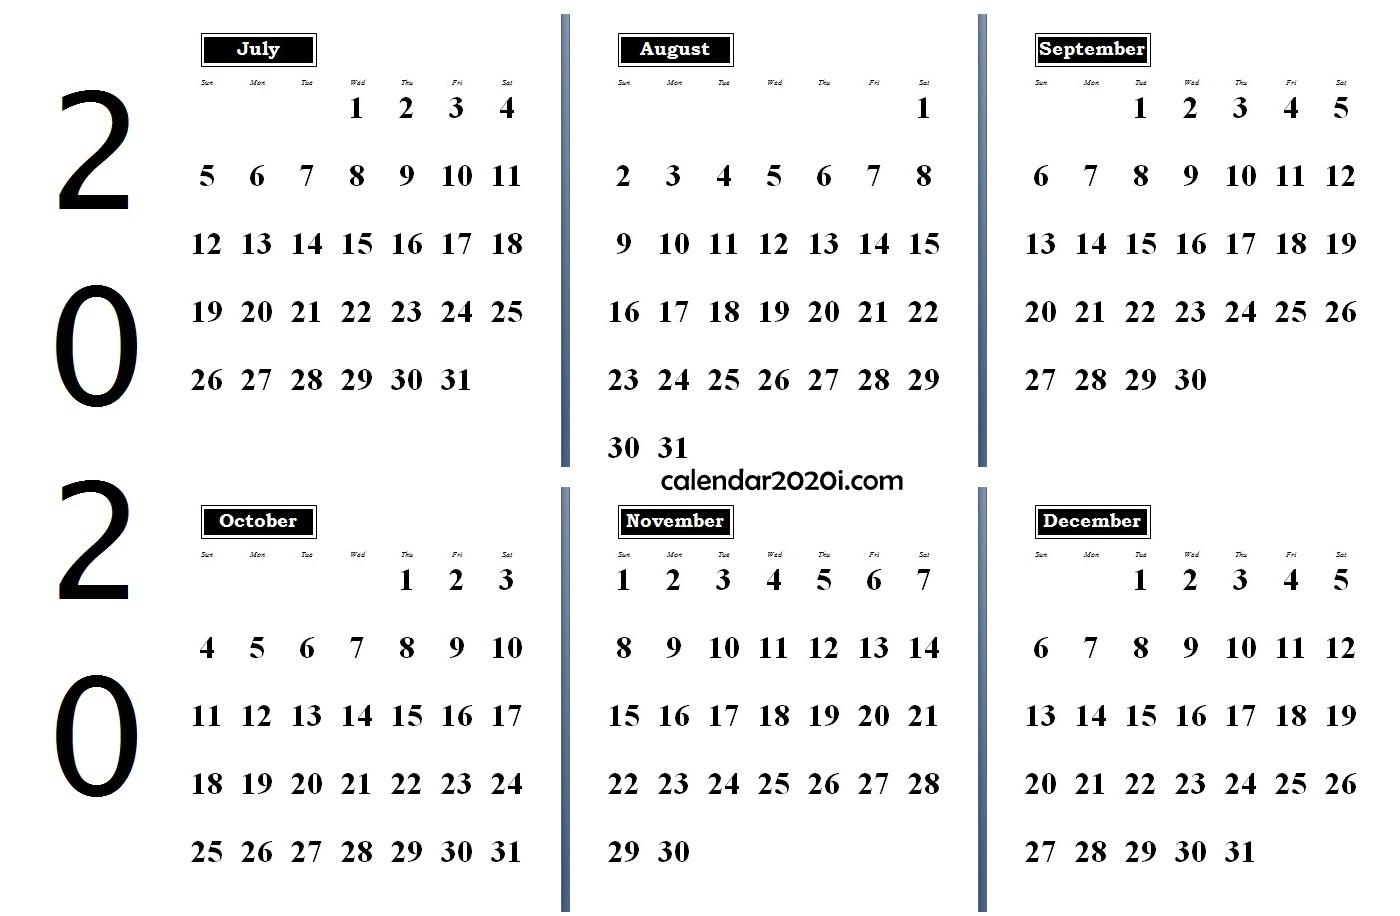 6 Months 2020 Half Year Printable Calendar | Calendar 2020 in Printable Calendar 2020 3 Months Per Page